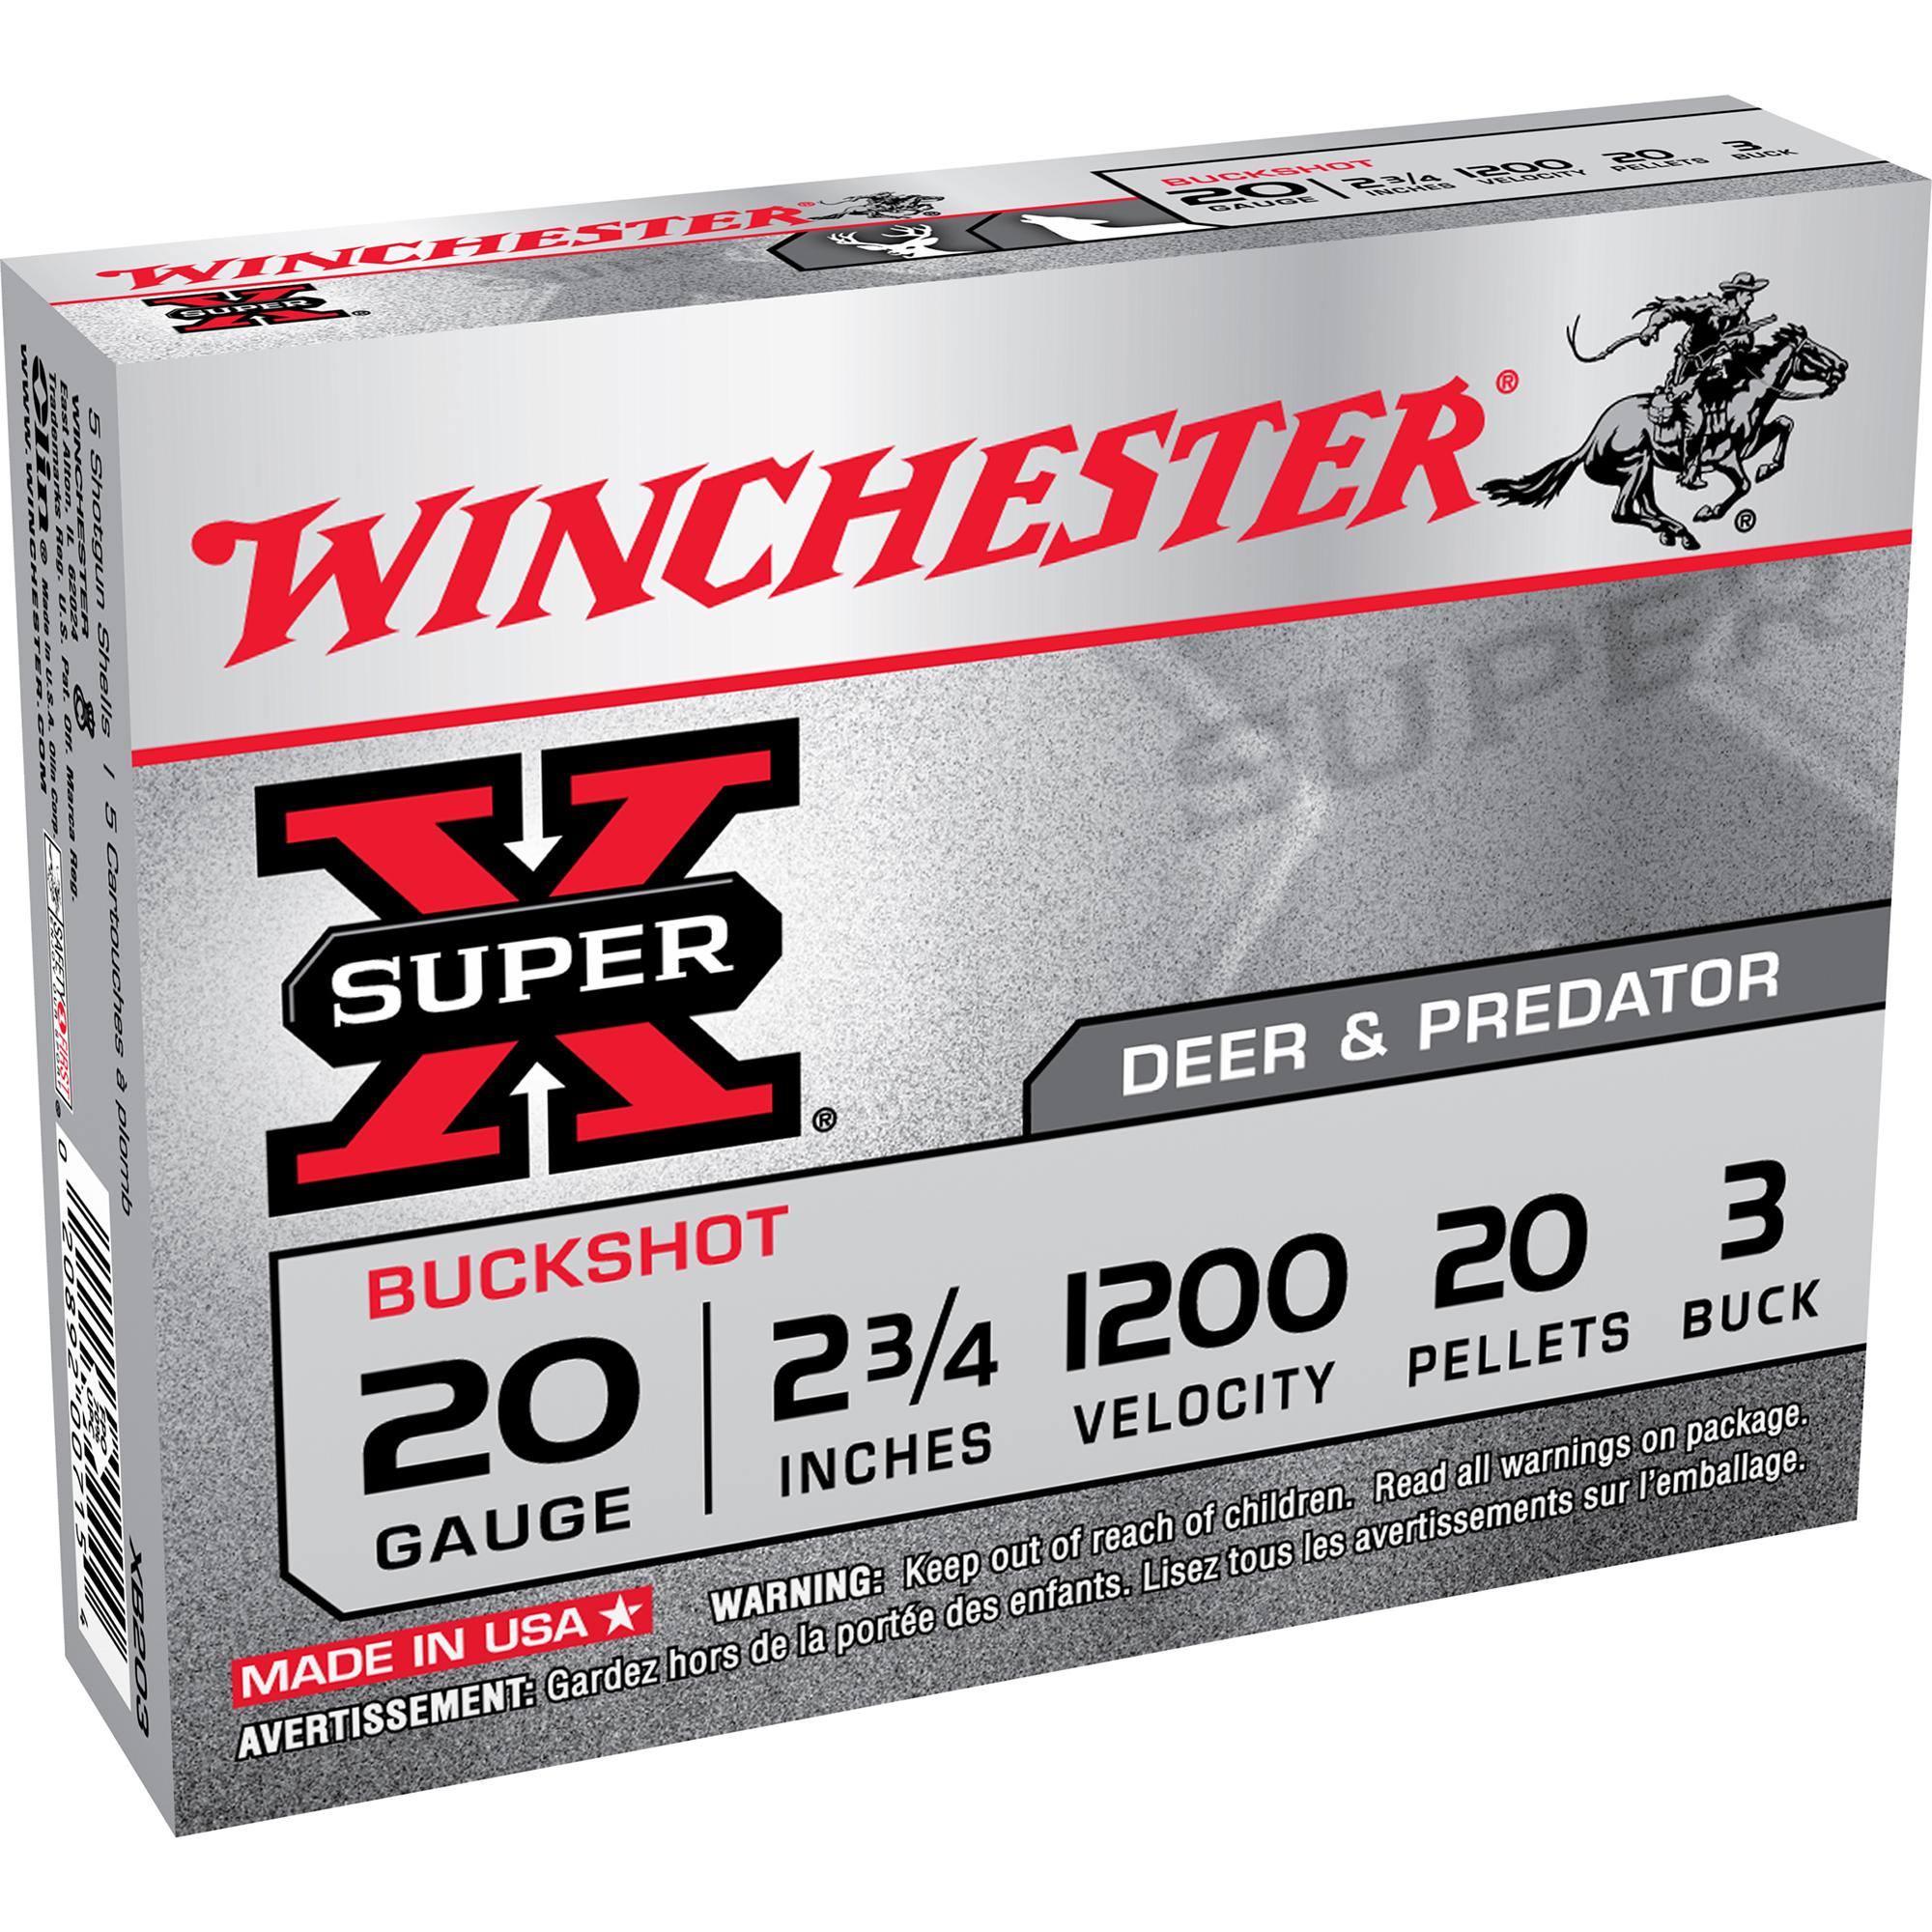 Winchester Super-X Buckshot, 20-ga, 2-3/4″, #3, 20 Pellets